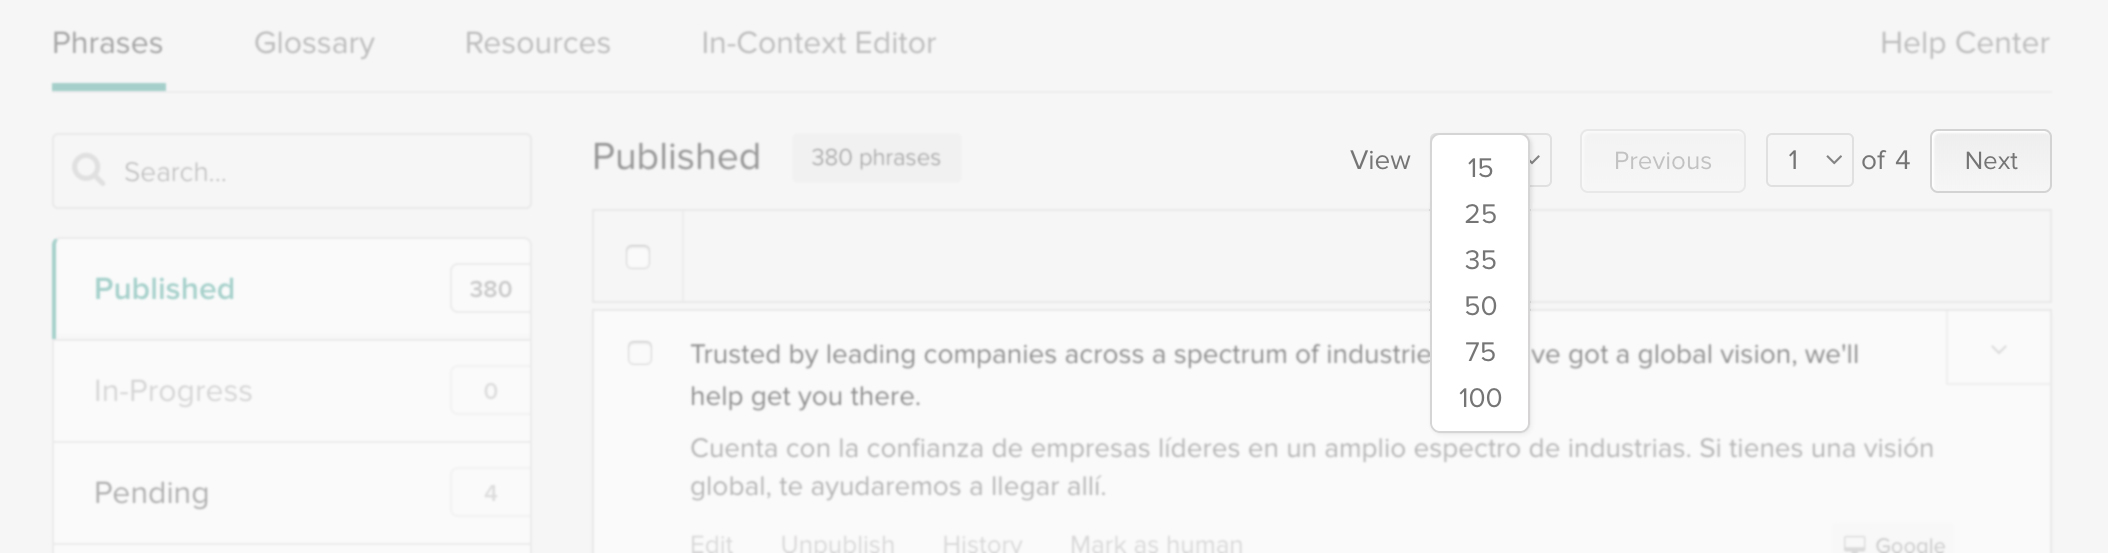 Localize - Application translation platform